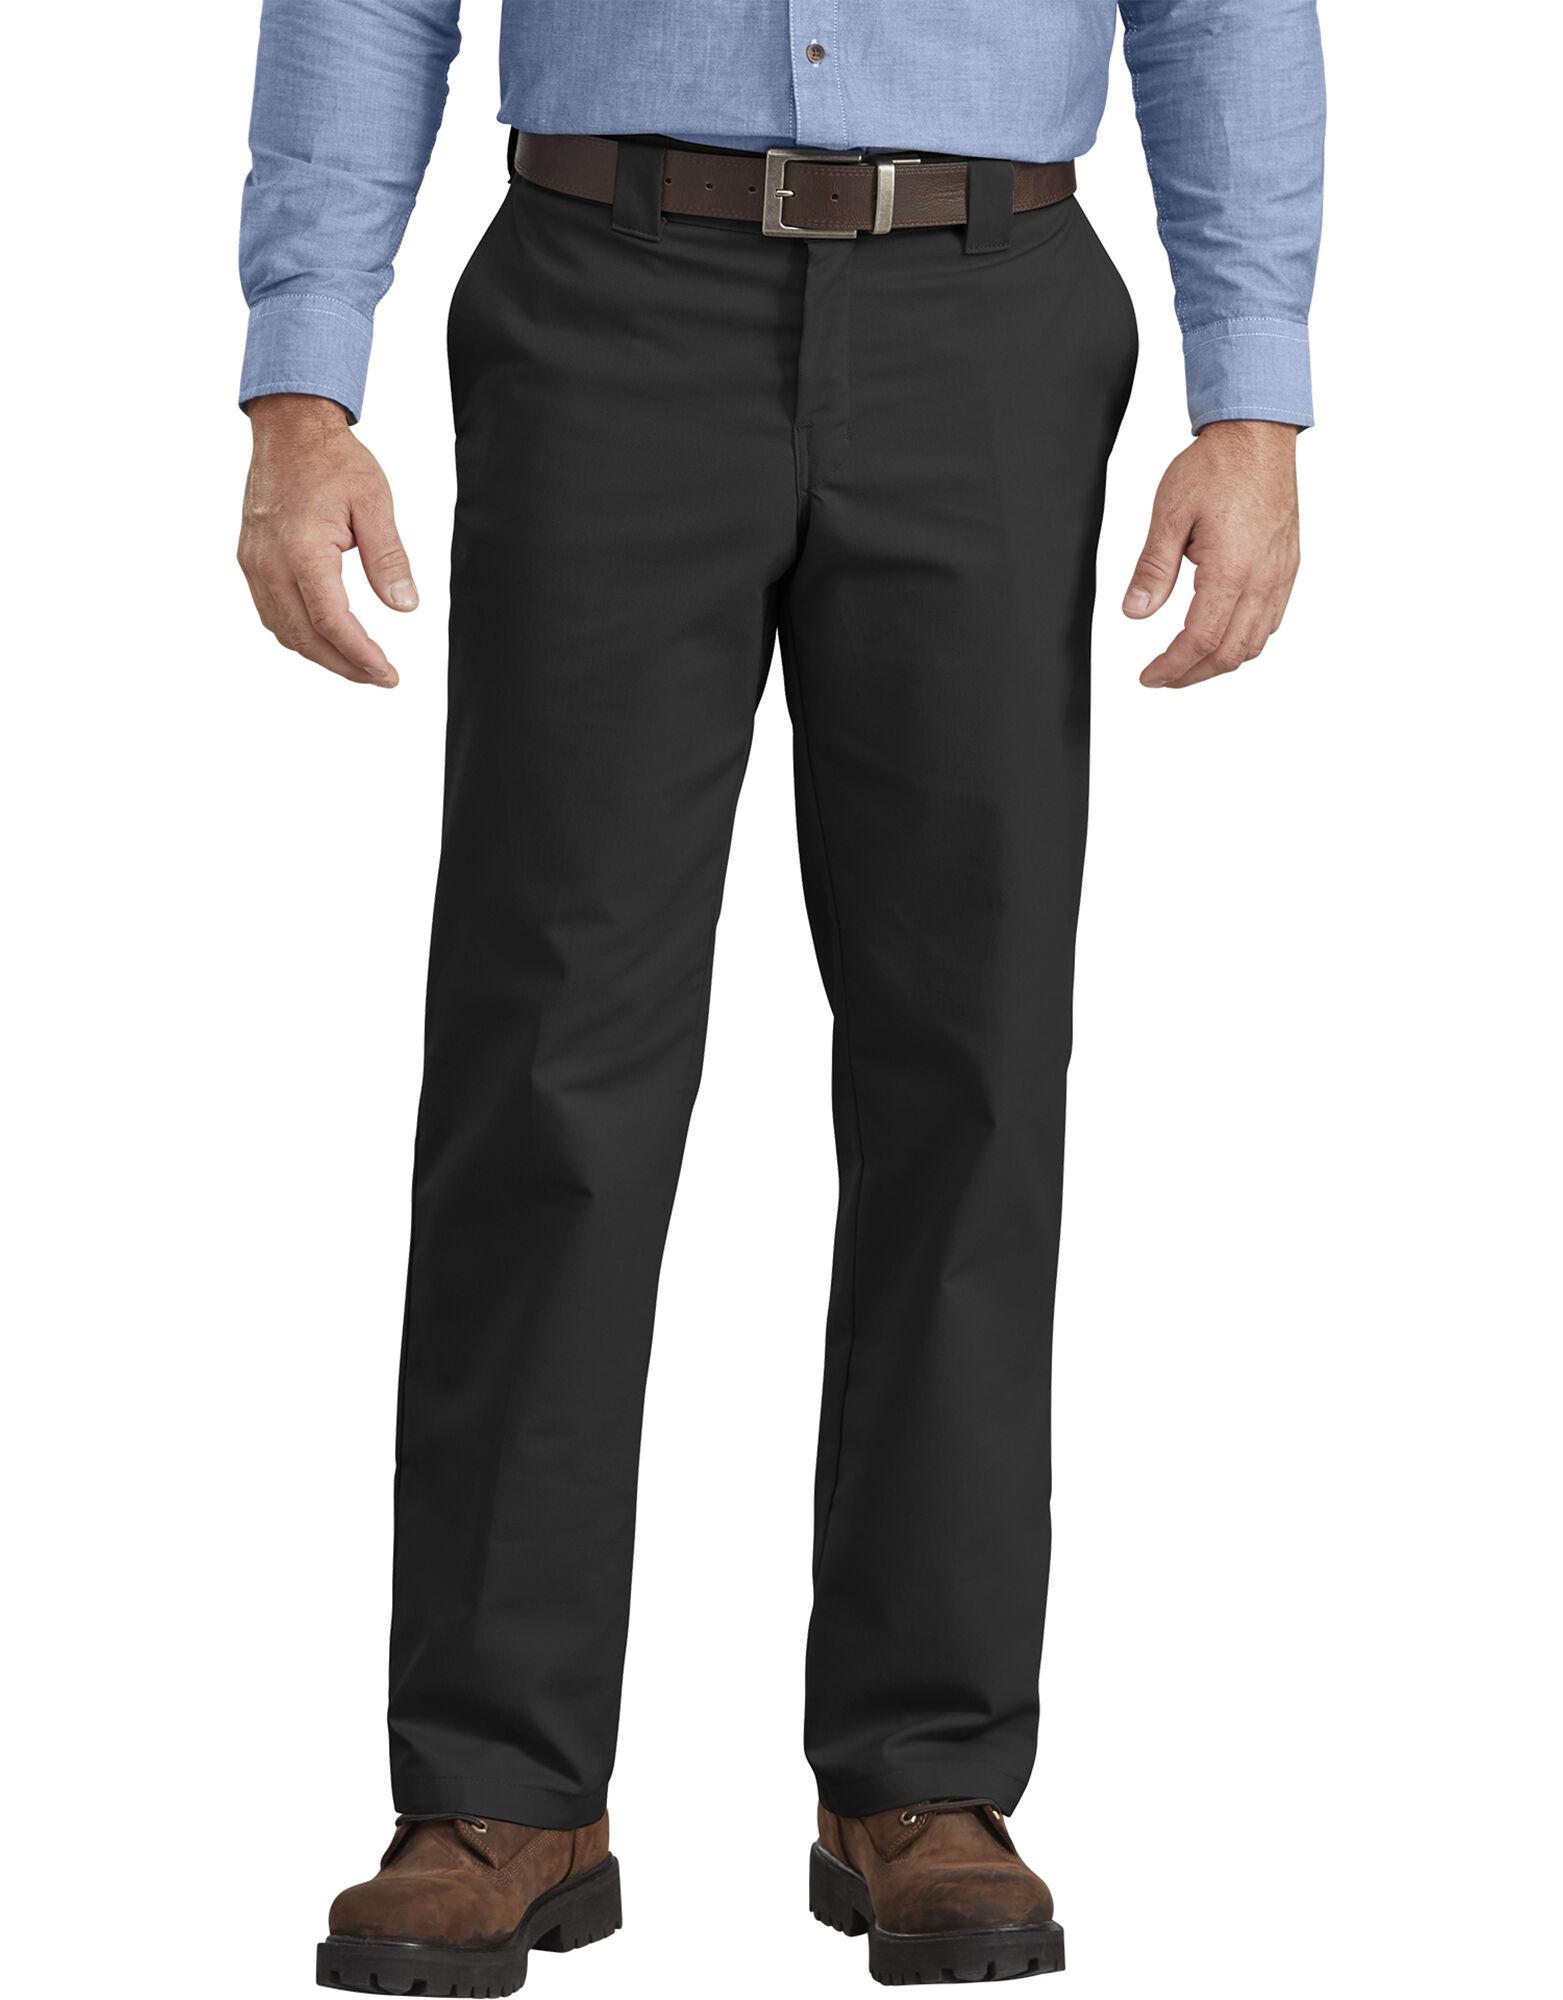 FLEX Regular Fit Straight Leg Twill Multi-Use Pocket Work Pants-Dickies Canada